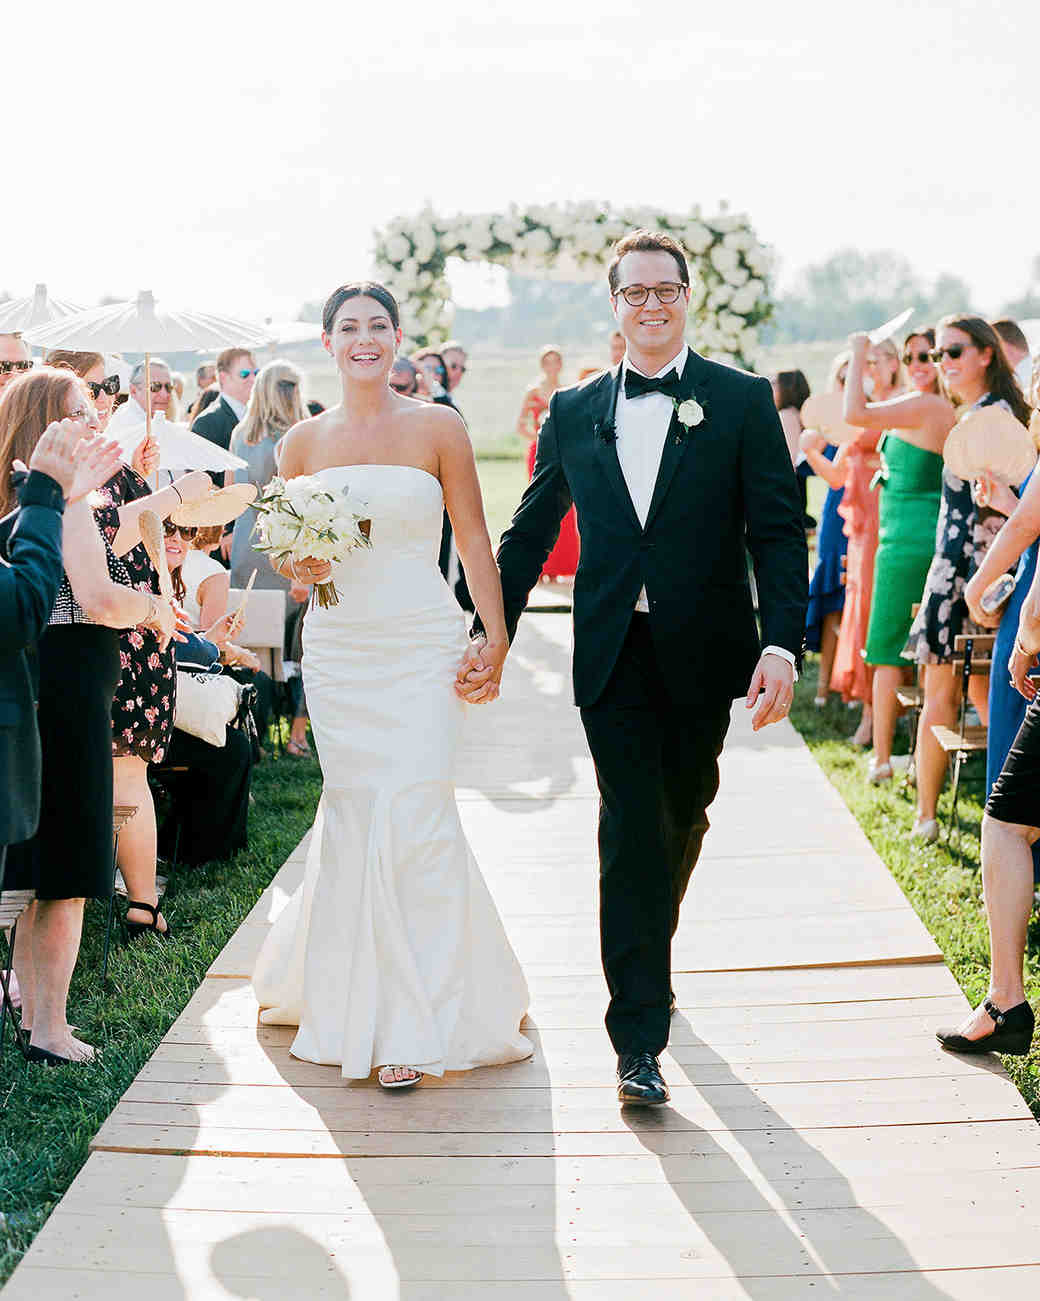 jamie jon wedding bride and groom recessional